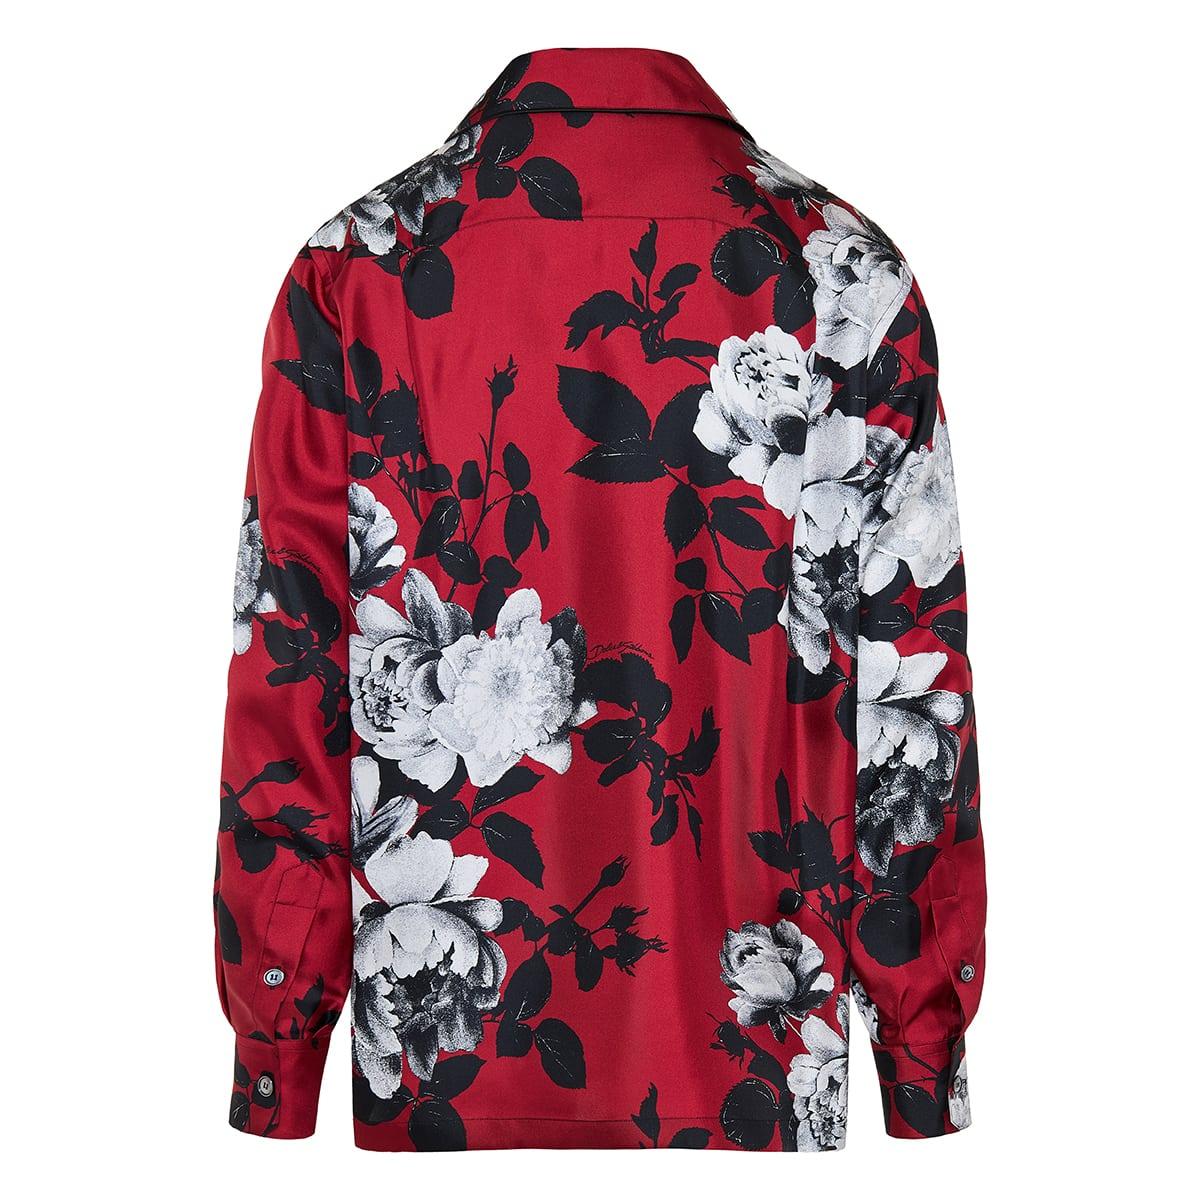 Floral silk pajama shirt